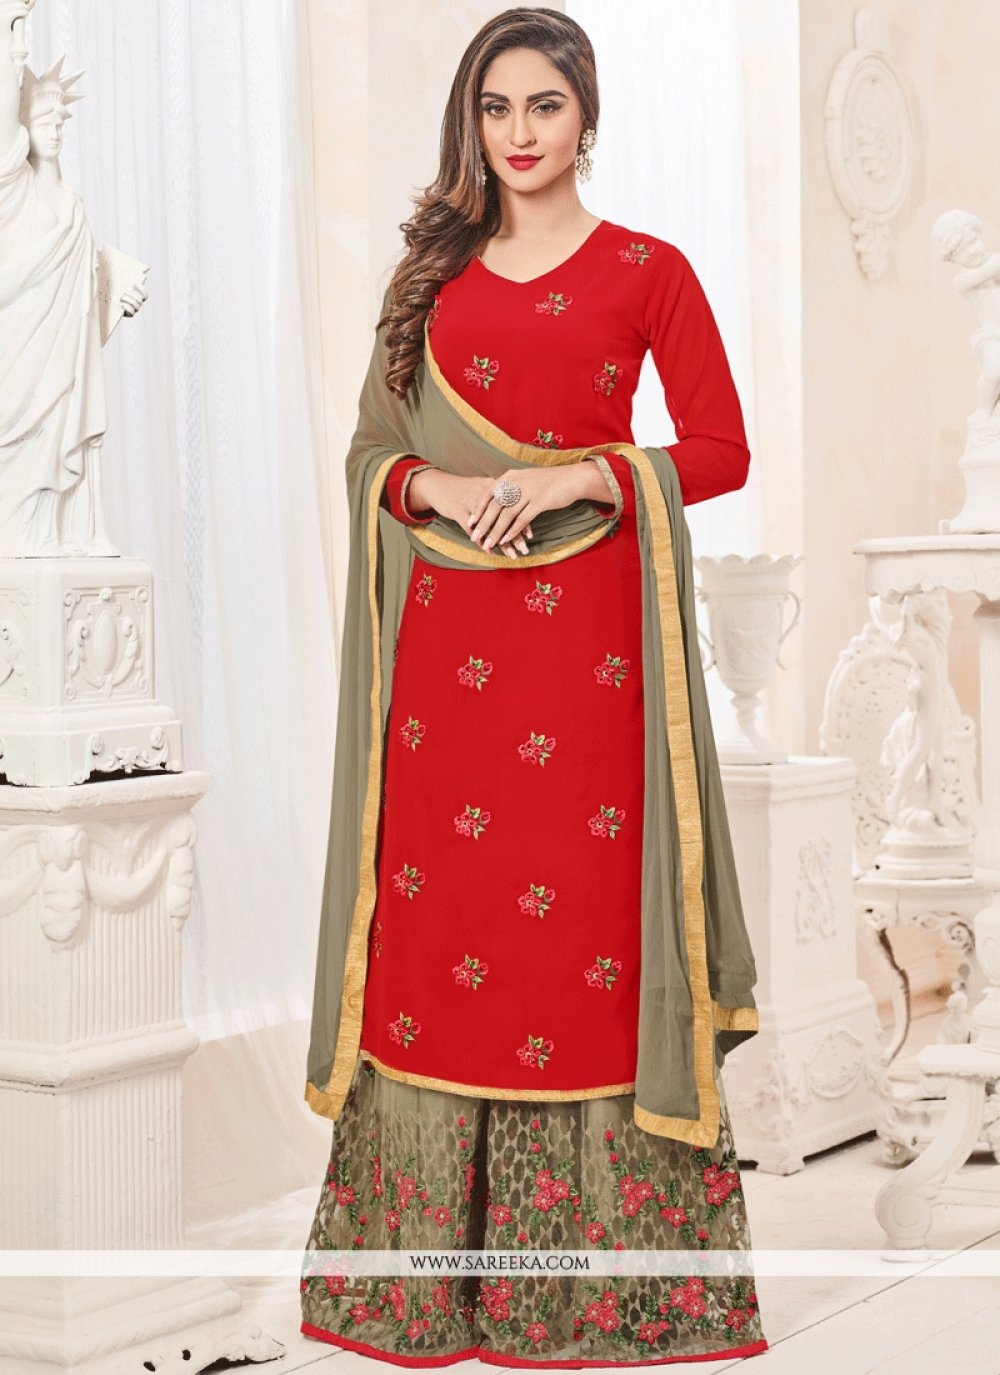 Krystle Dsouza Red Lace Work Designer Palazzo Suit